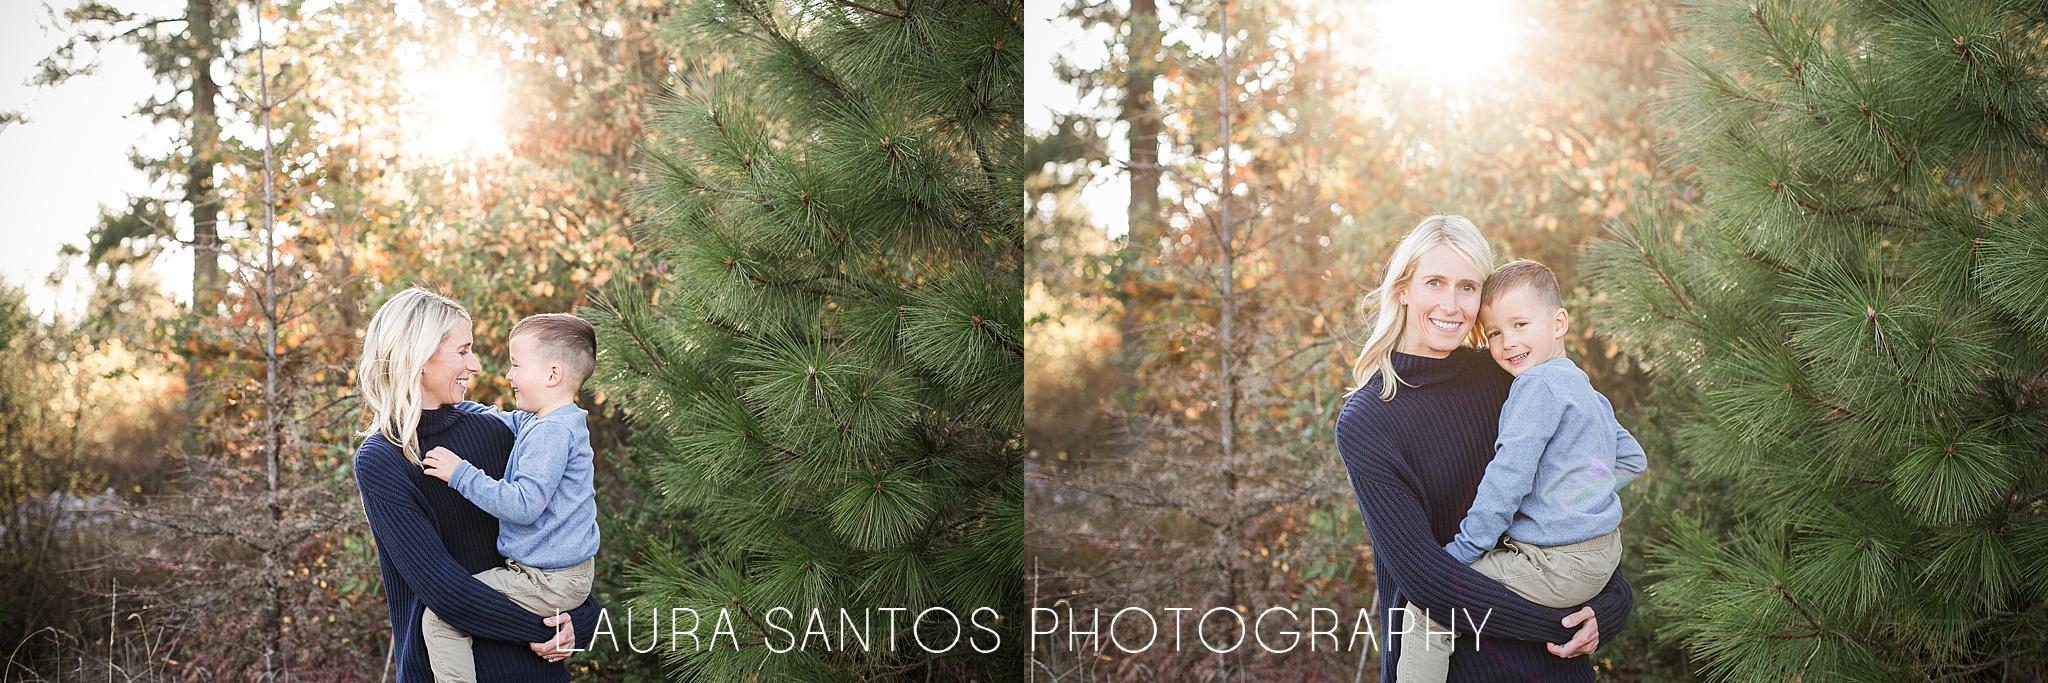 Laura Santos Photography Portland Oregon Family Photographer_0811.jpg